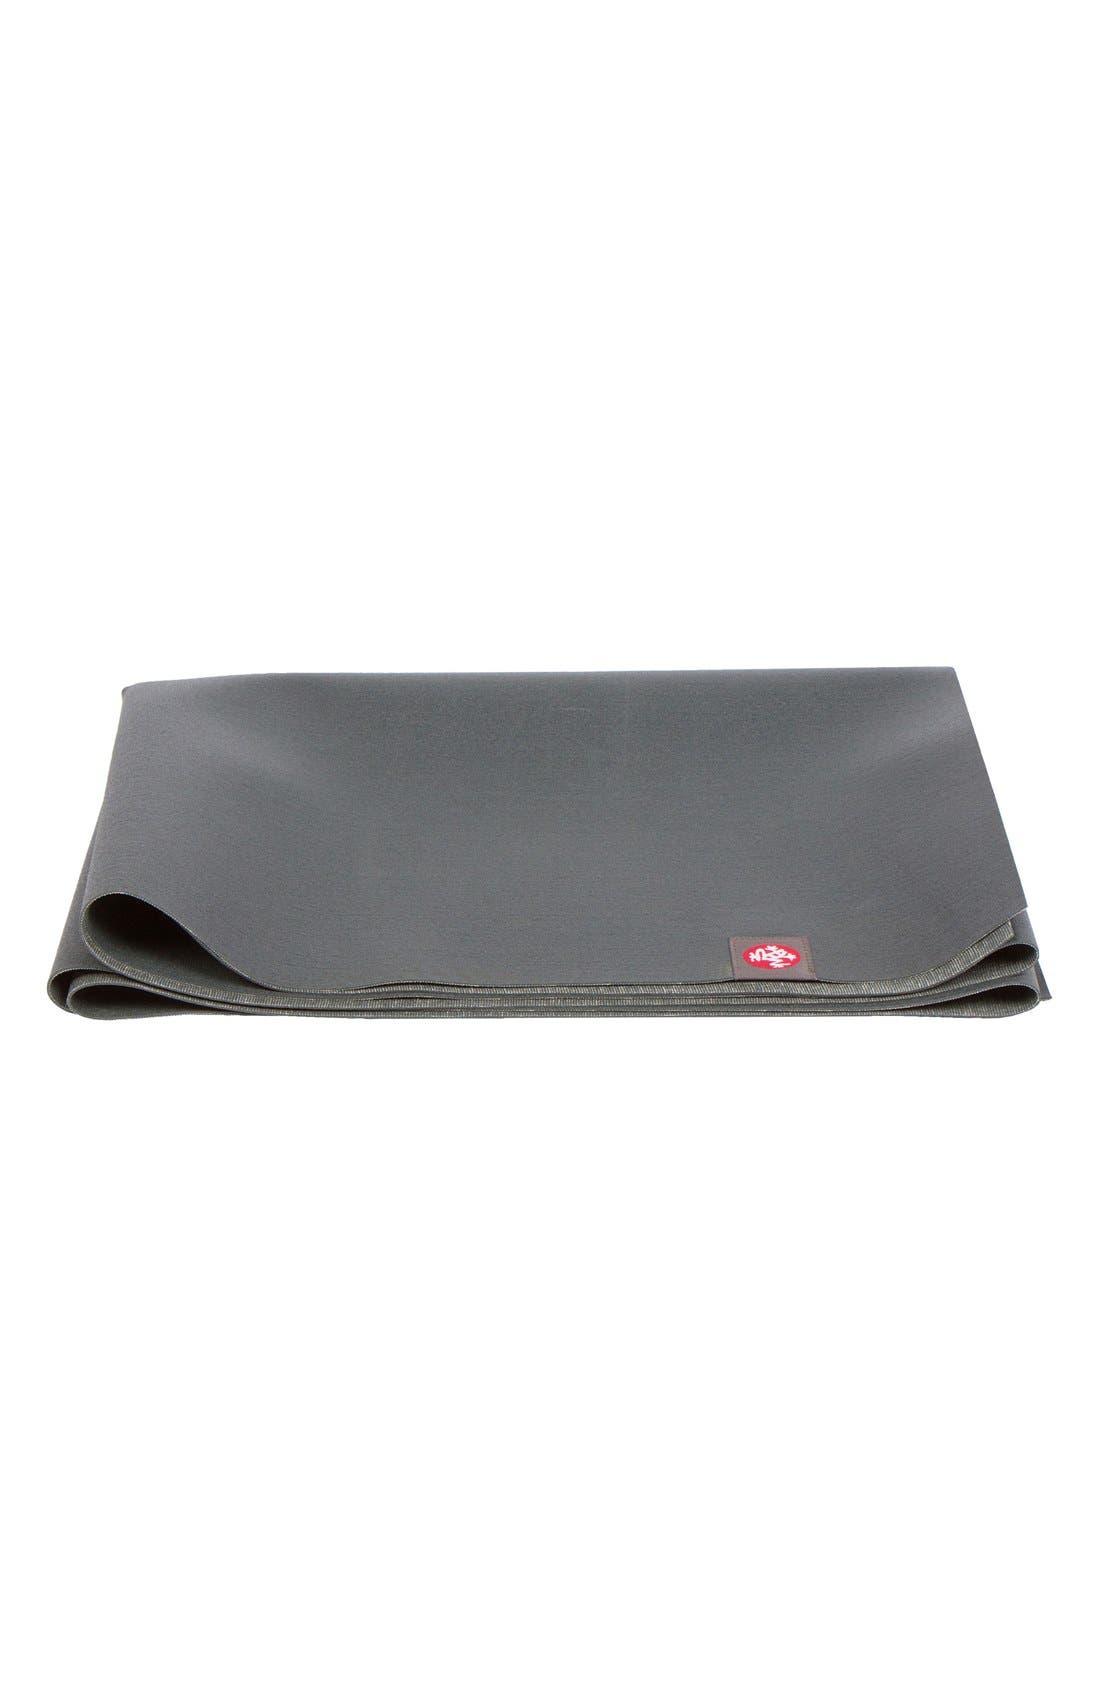 Alternate Image 3  - Manduka 'eKO SuperLite' Travel Yoga Mat